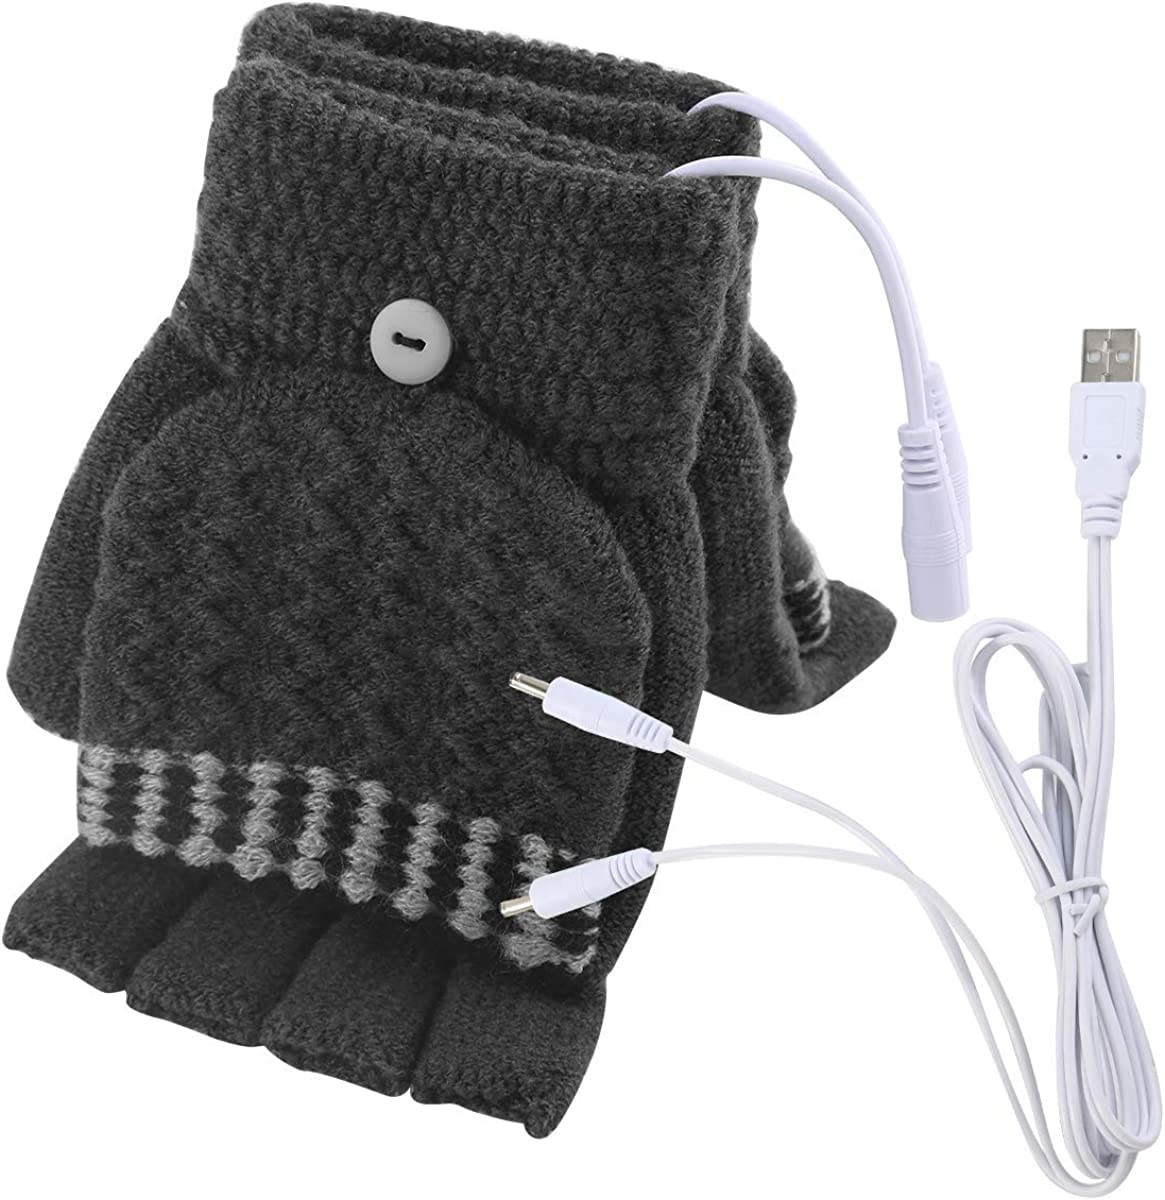 Women's & Men's USB Heated Gloves Mitten Full & Half Fingerless Winter Hands Warmer Laptop Gloves